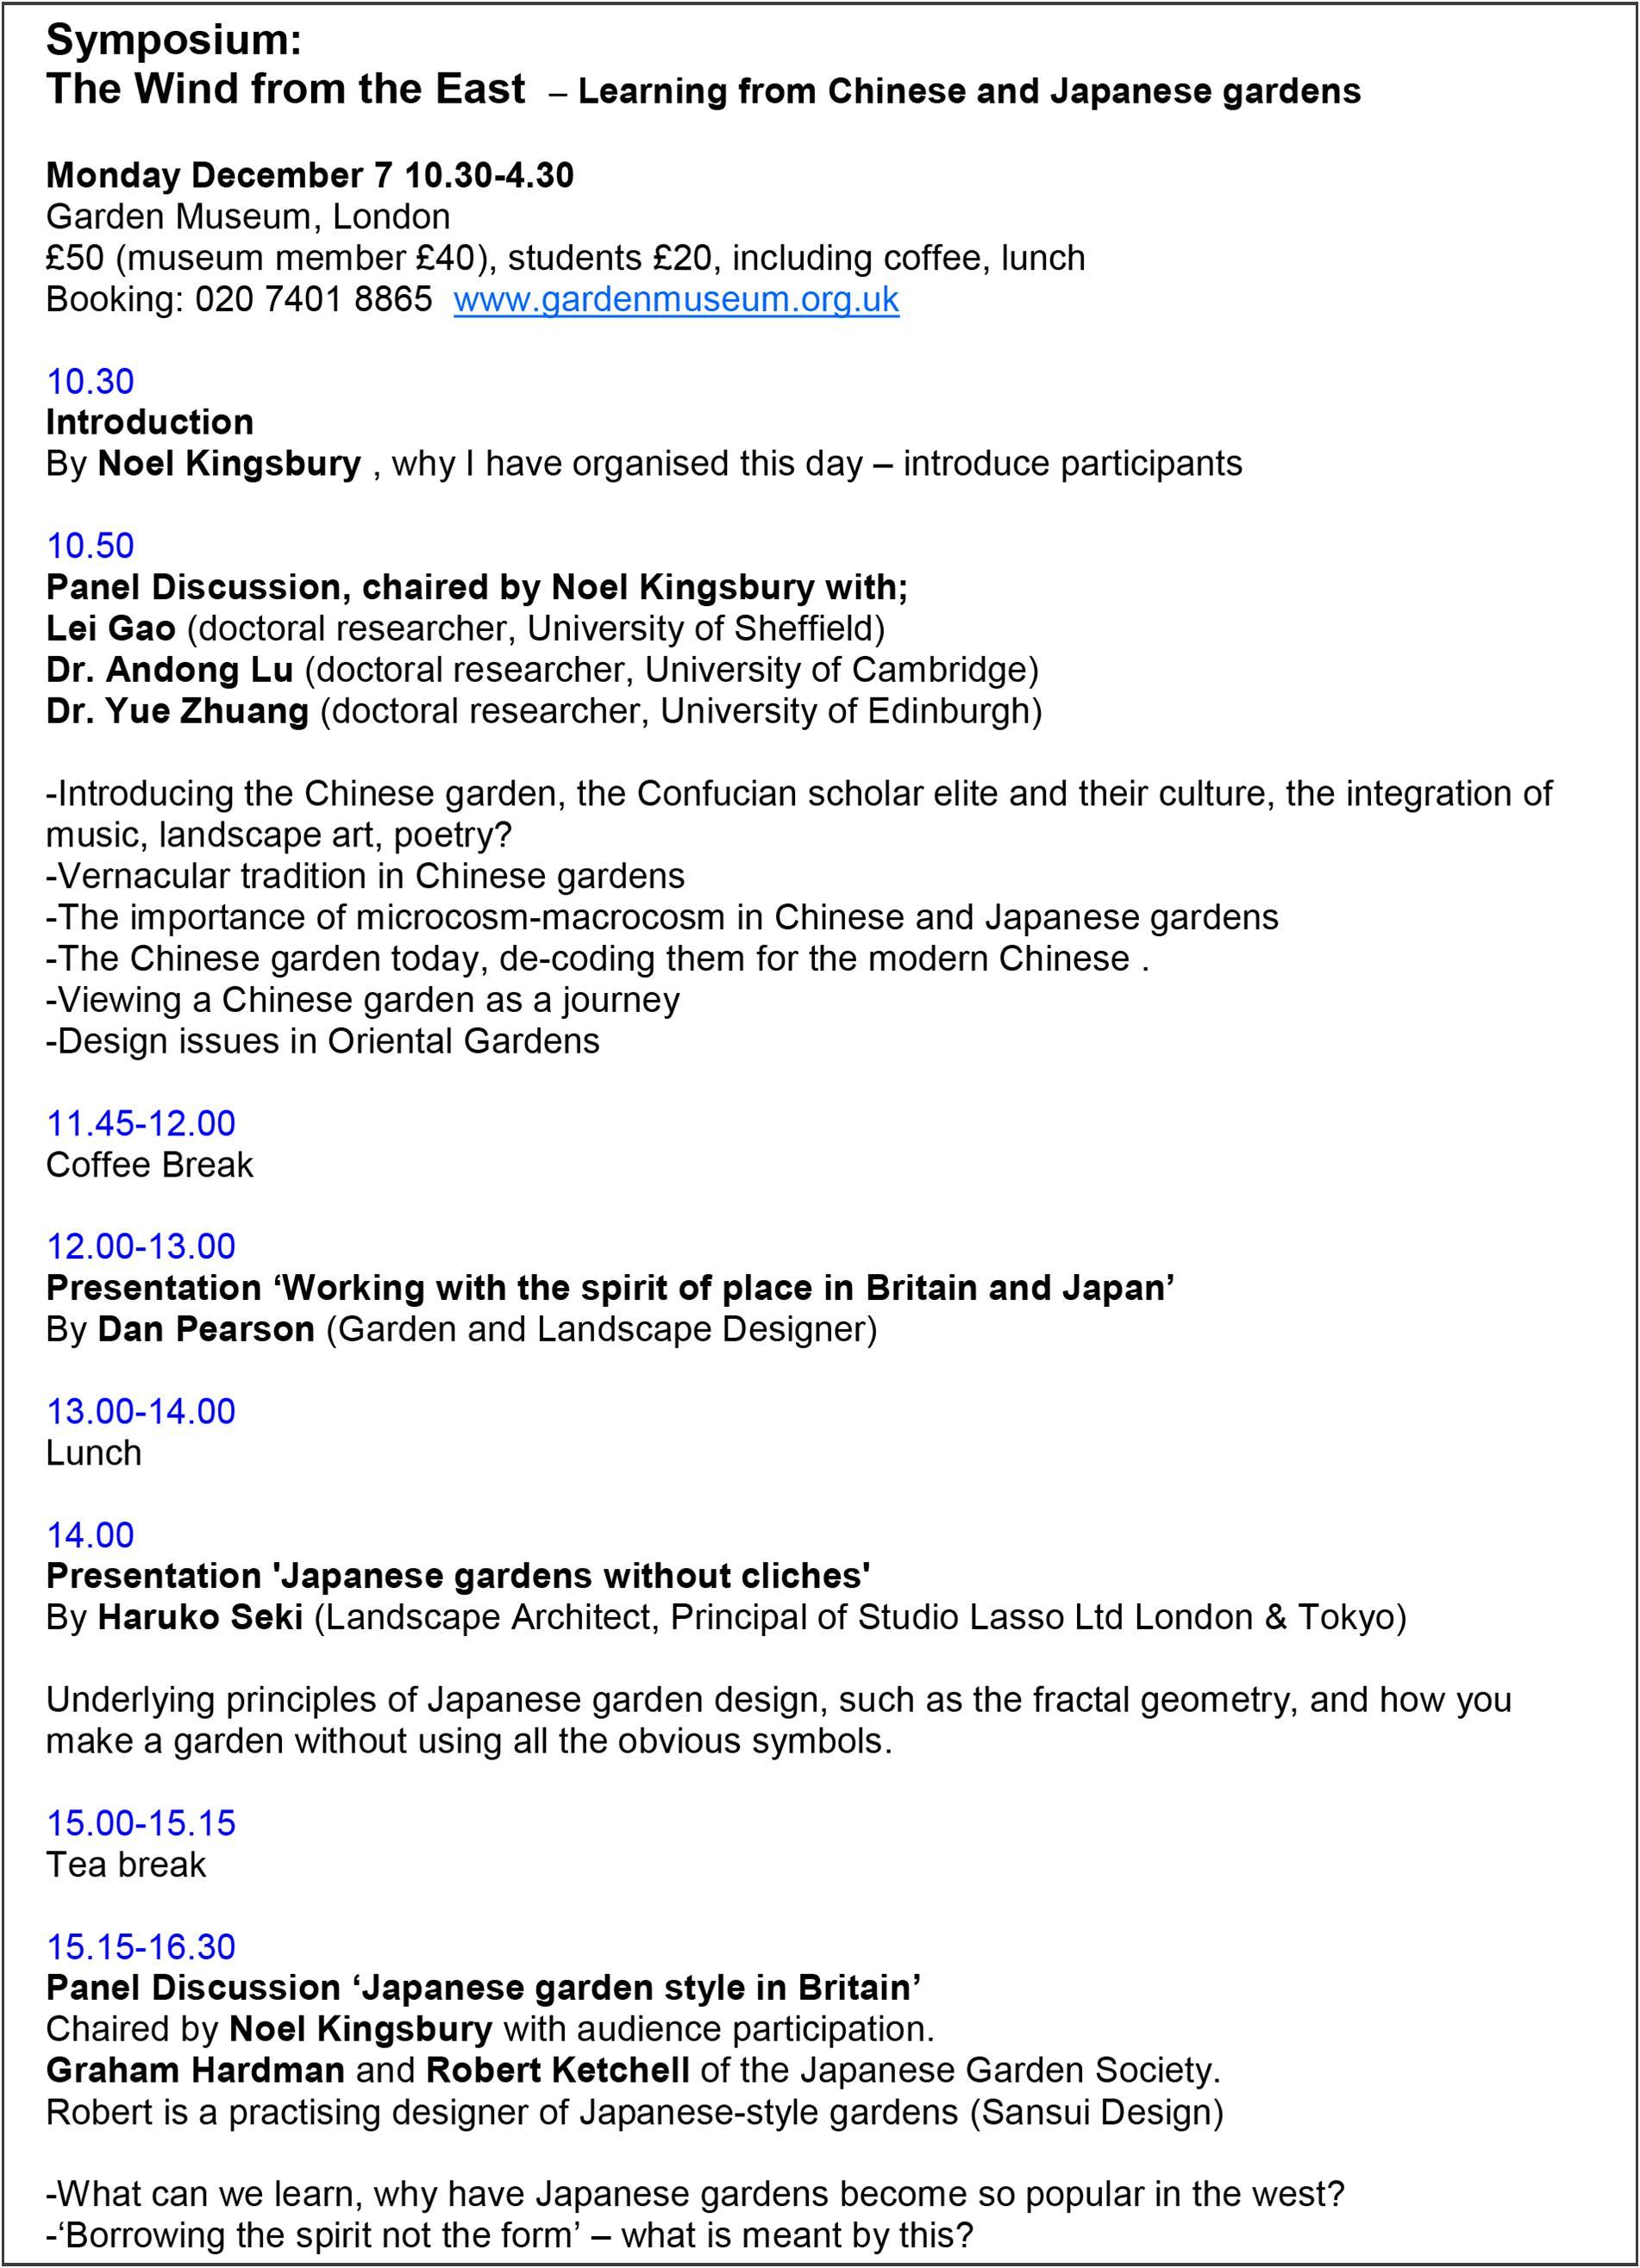 Symposium programme (Click to enlarge)